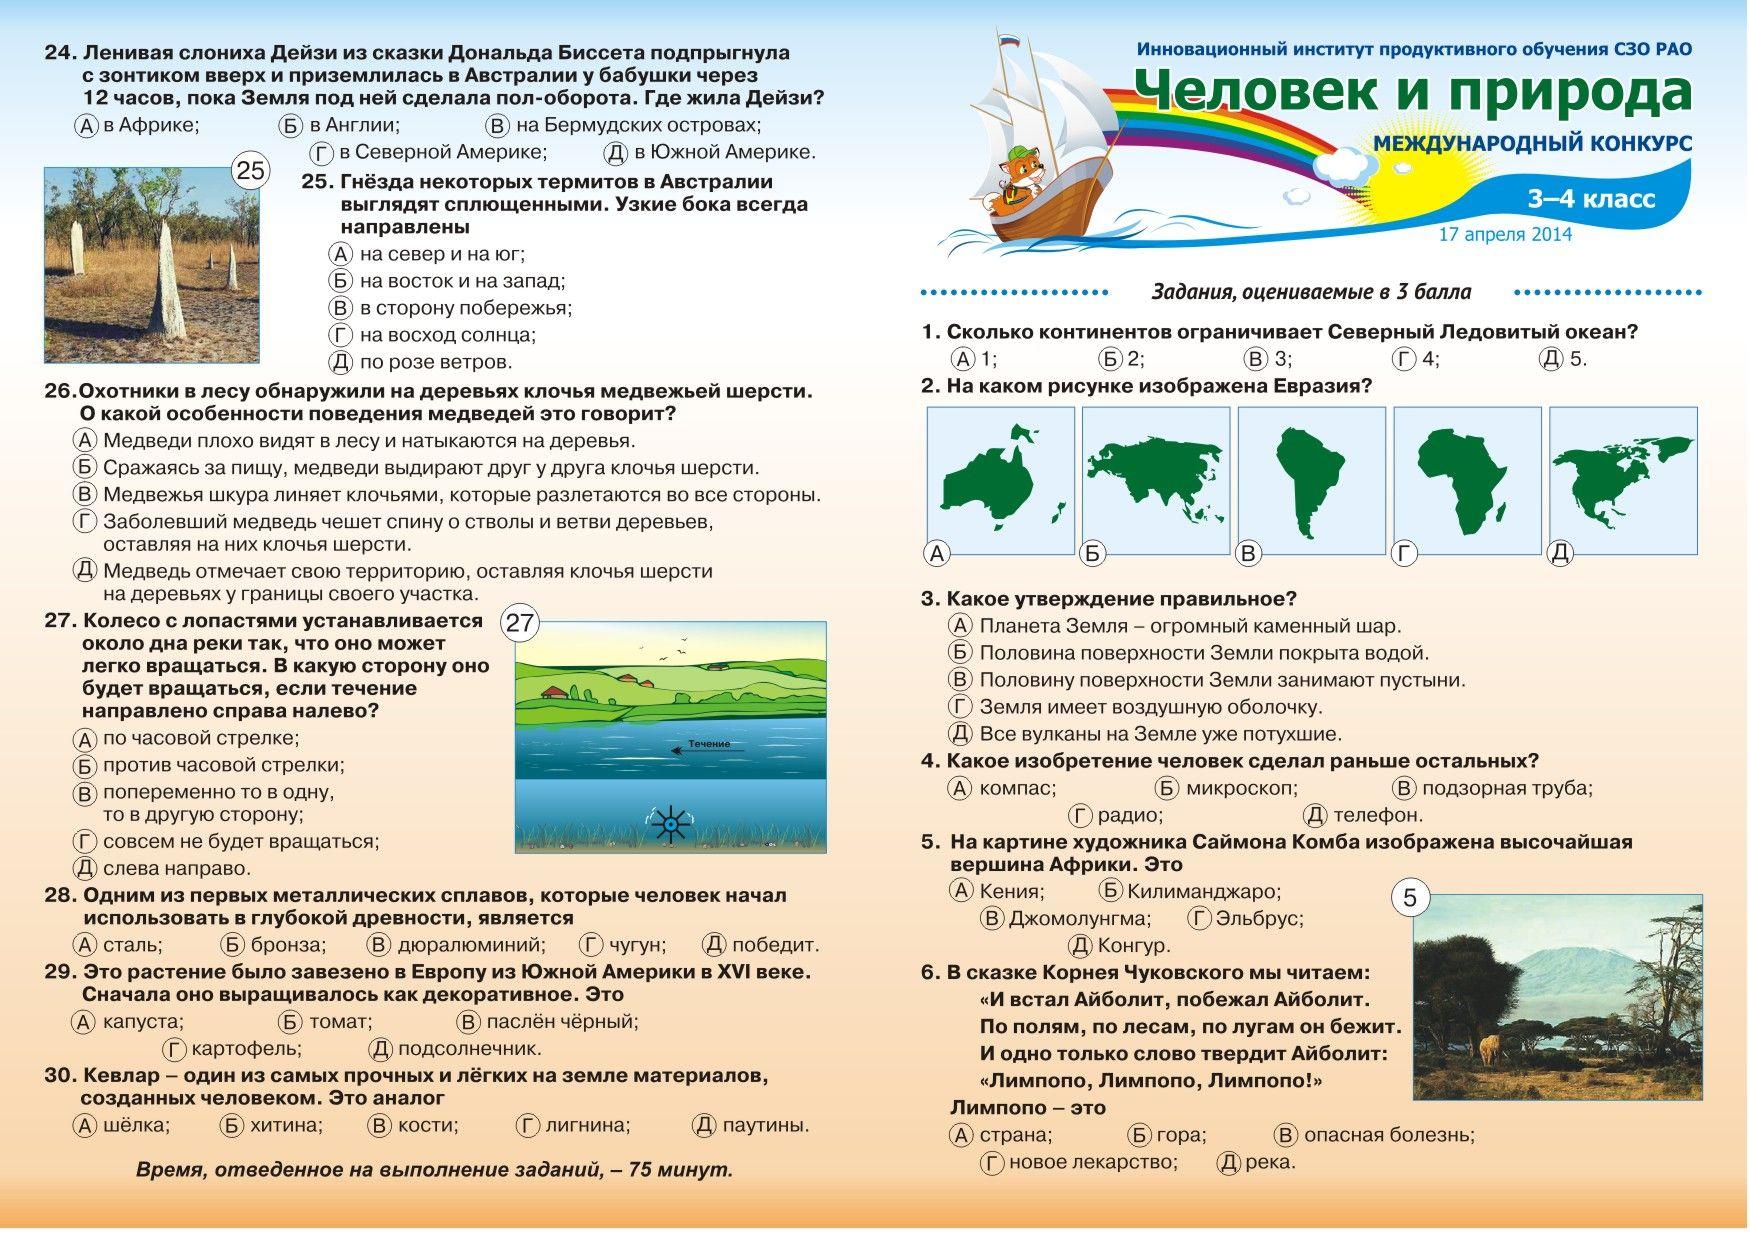 Гдз по русскому языку 3 класс зеленина хохлова 2 ч 2018г стр.15 упр